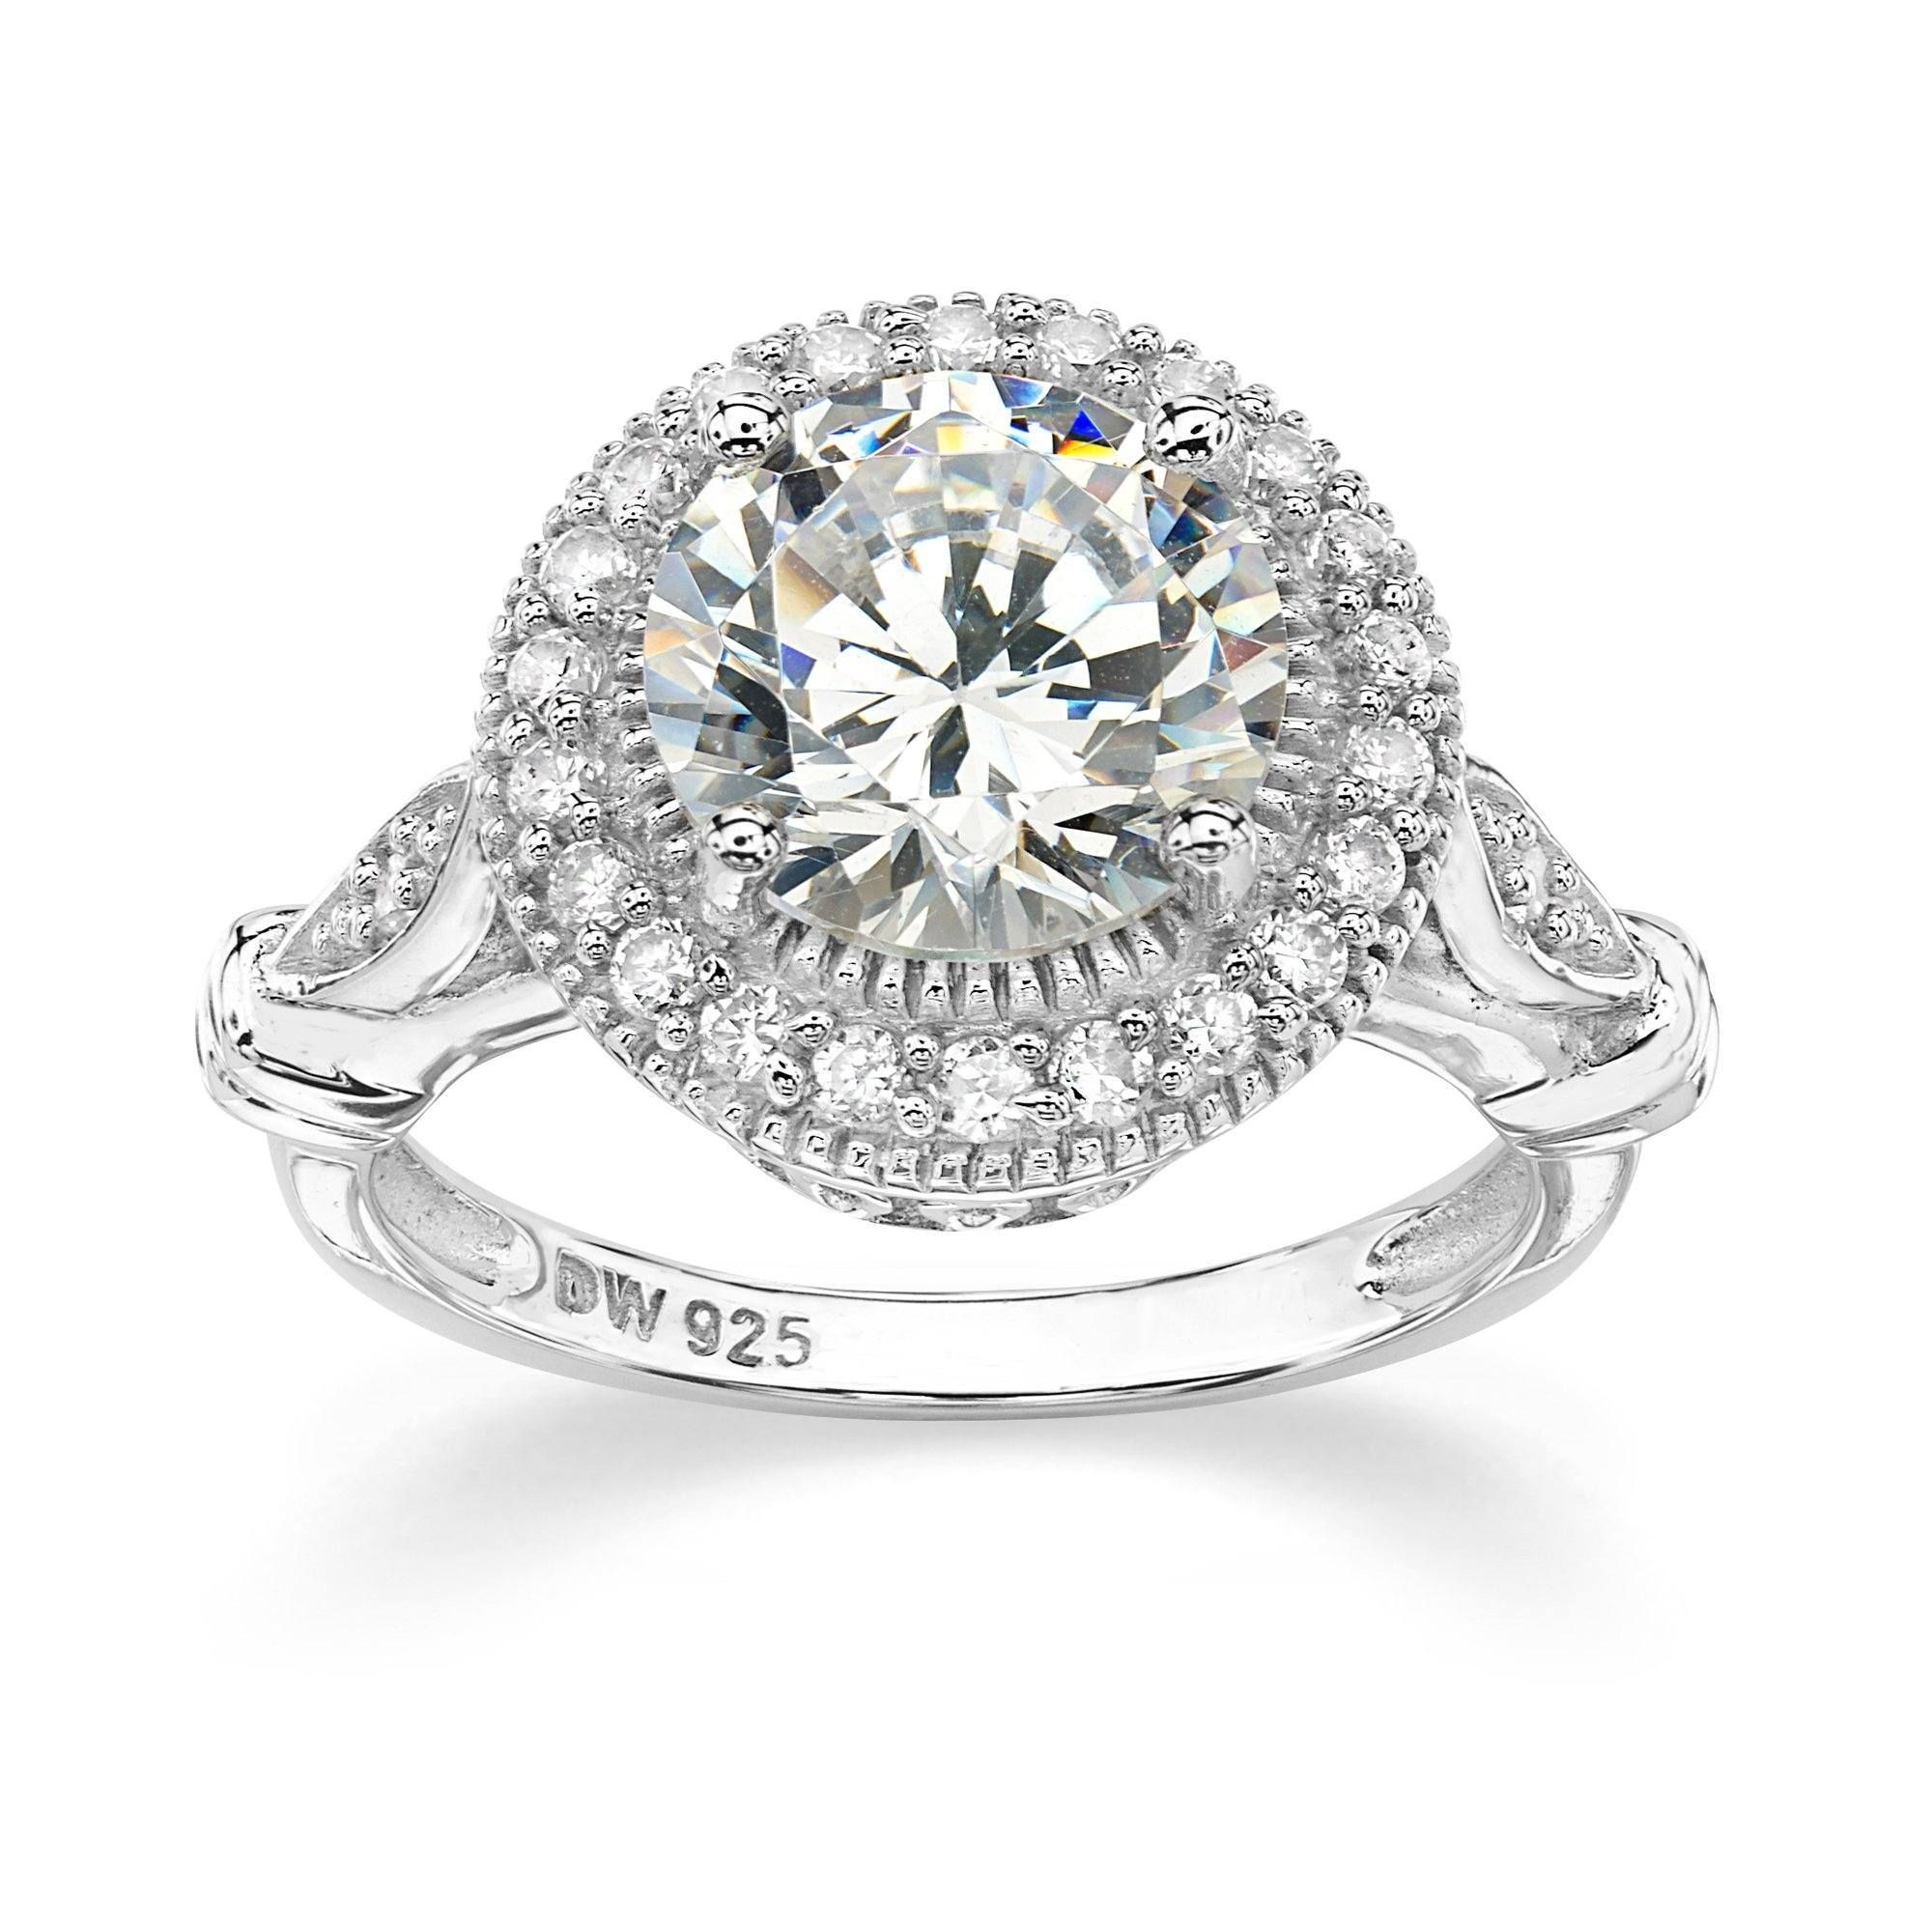 rings Birmingham Jewelry Three stone engagement rings